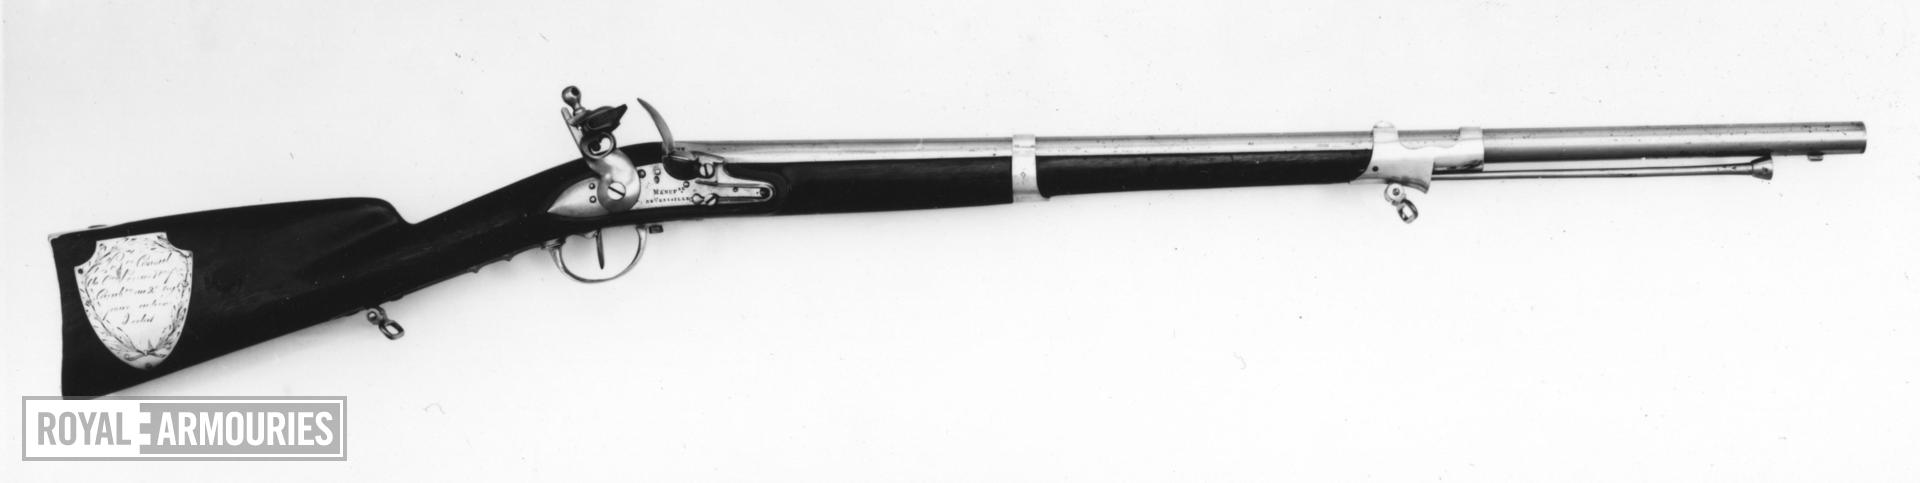 Flintlock muzzle-loading carbine - Modele An IX (1800-01)